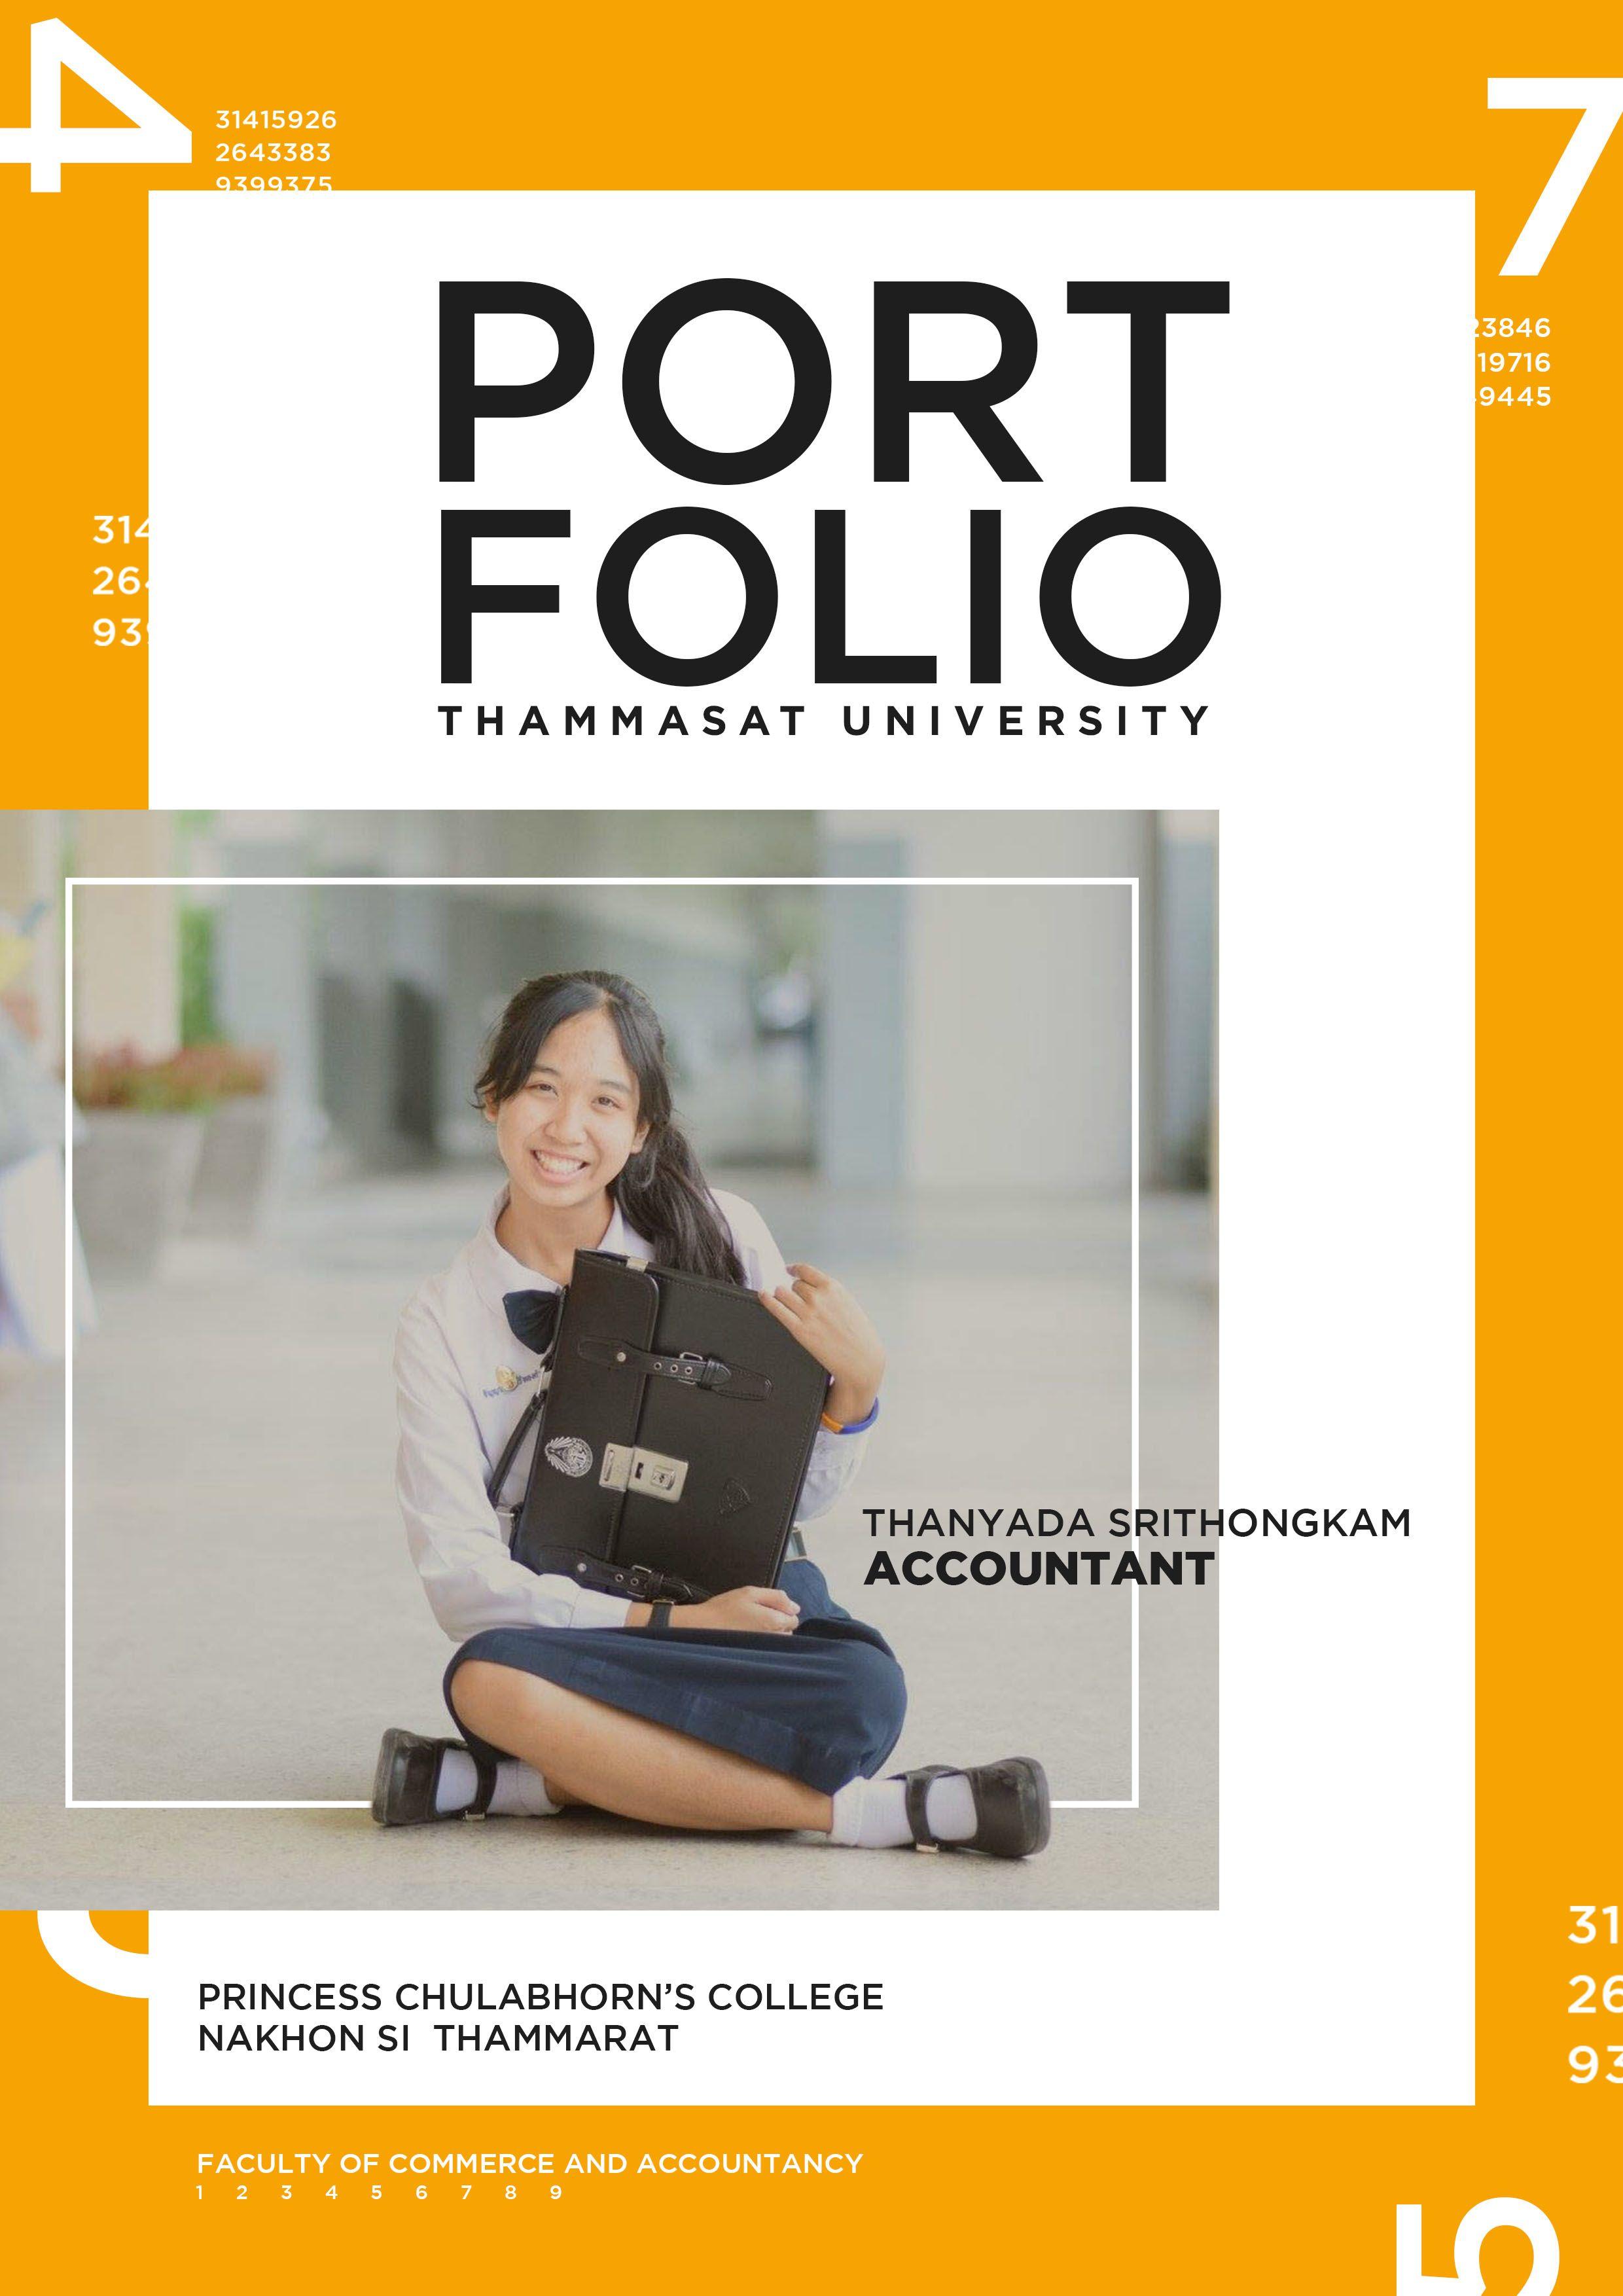 PORTFOLIO Thammasat   การออกแบบปกหนังสือ ปกหนังสือ และ พอร ...